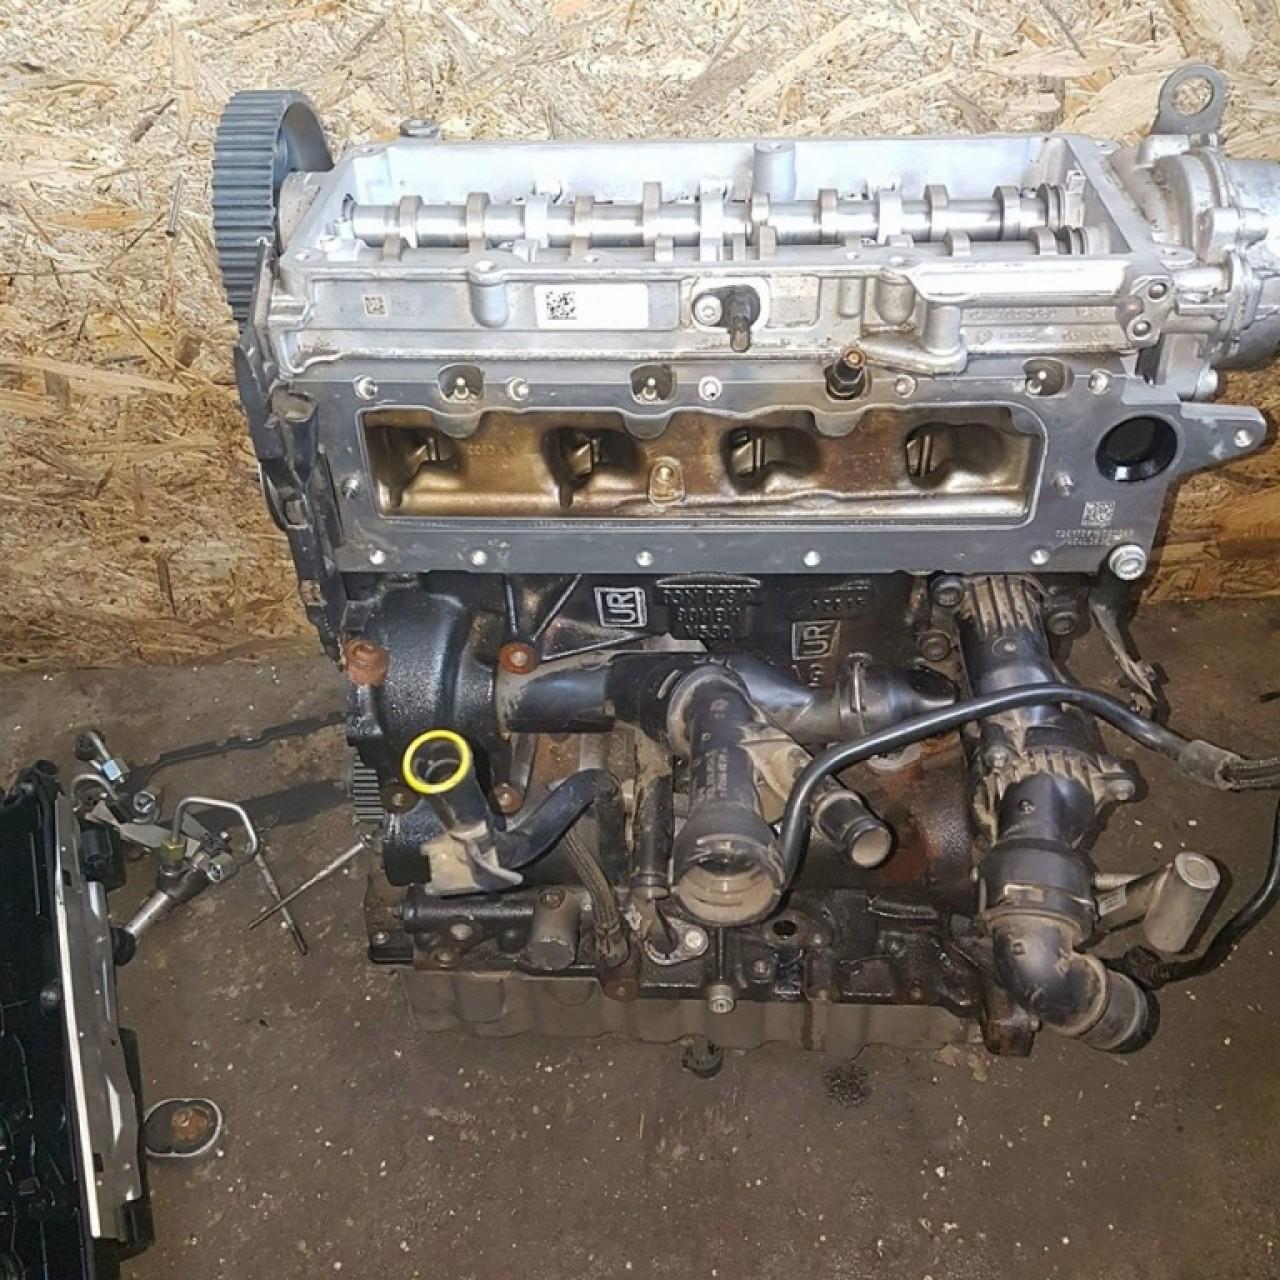 Motor audi a3 8v 2.0 tdi crlb euro 6 150 cai 3000 km